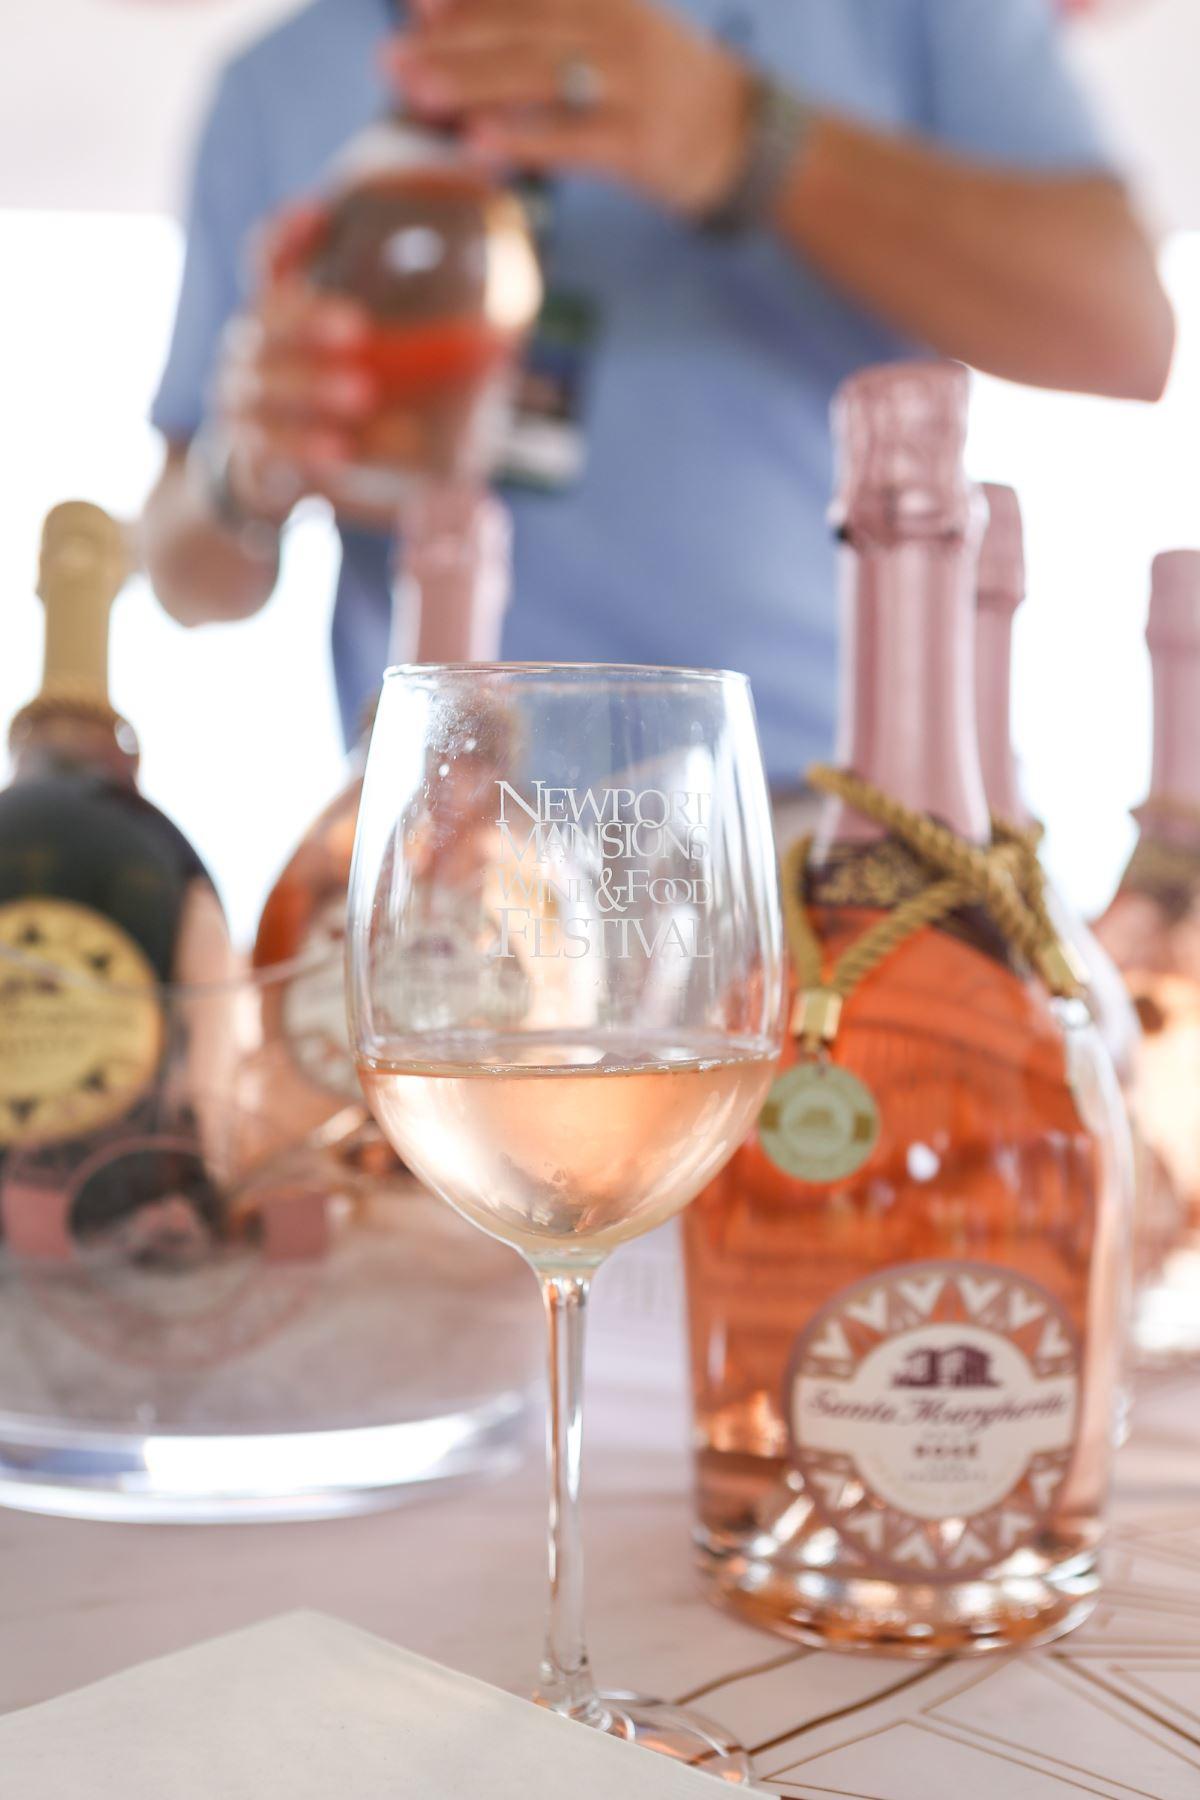 Annual Newport Mansions Wine & Food Festival Returns